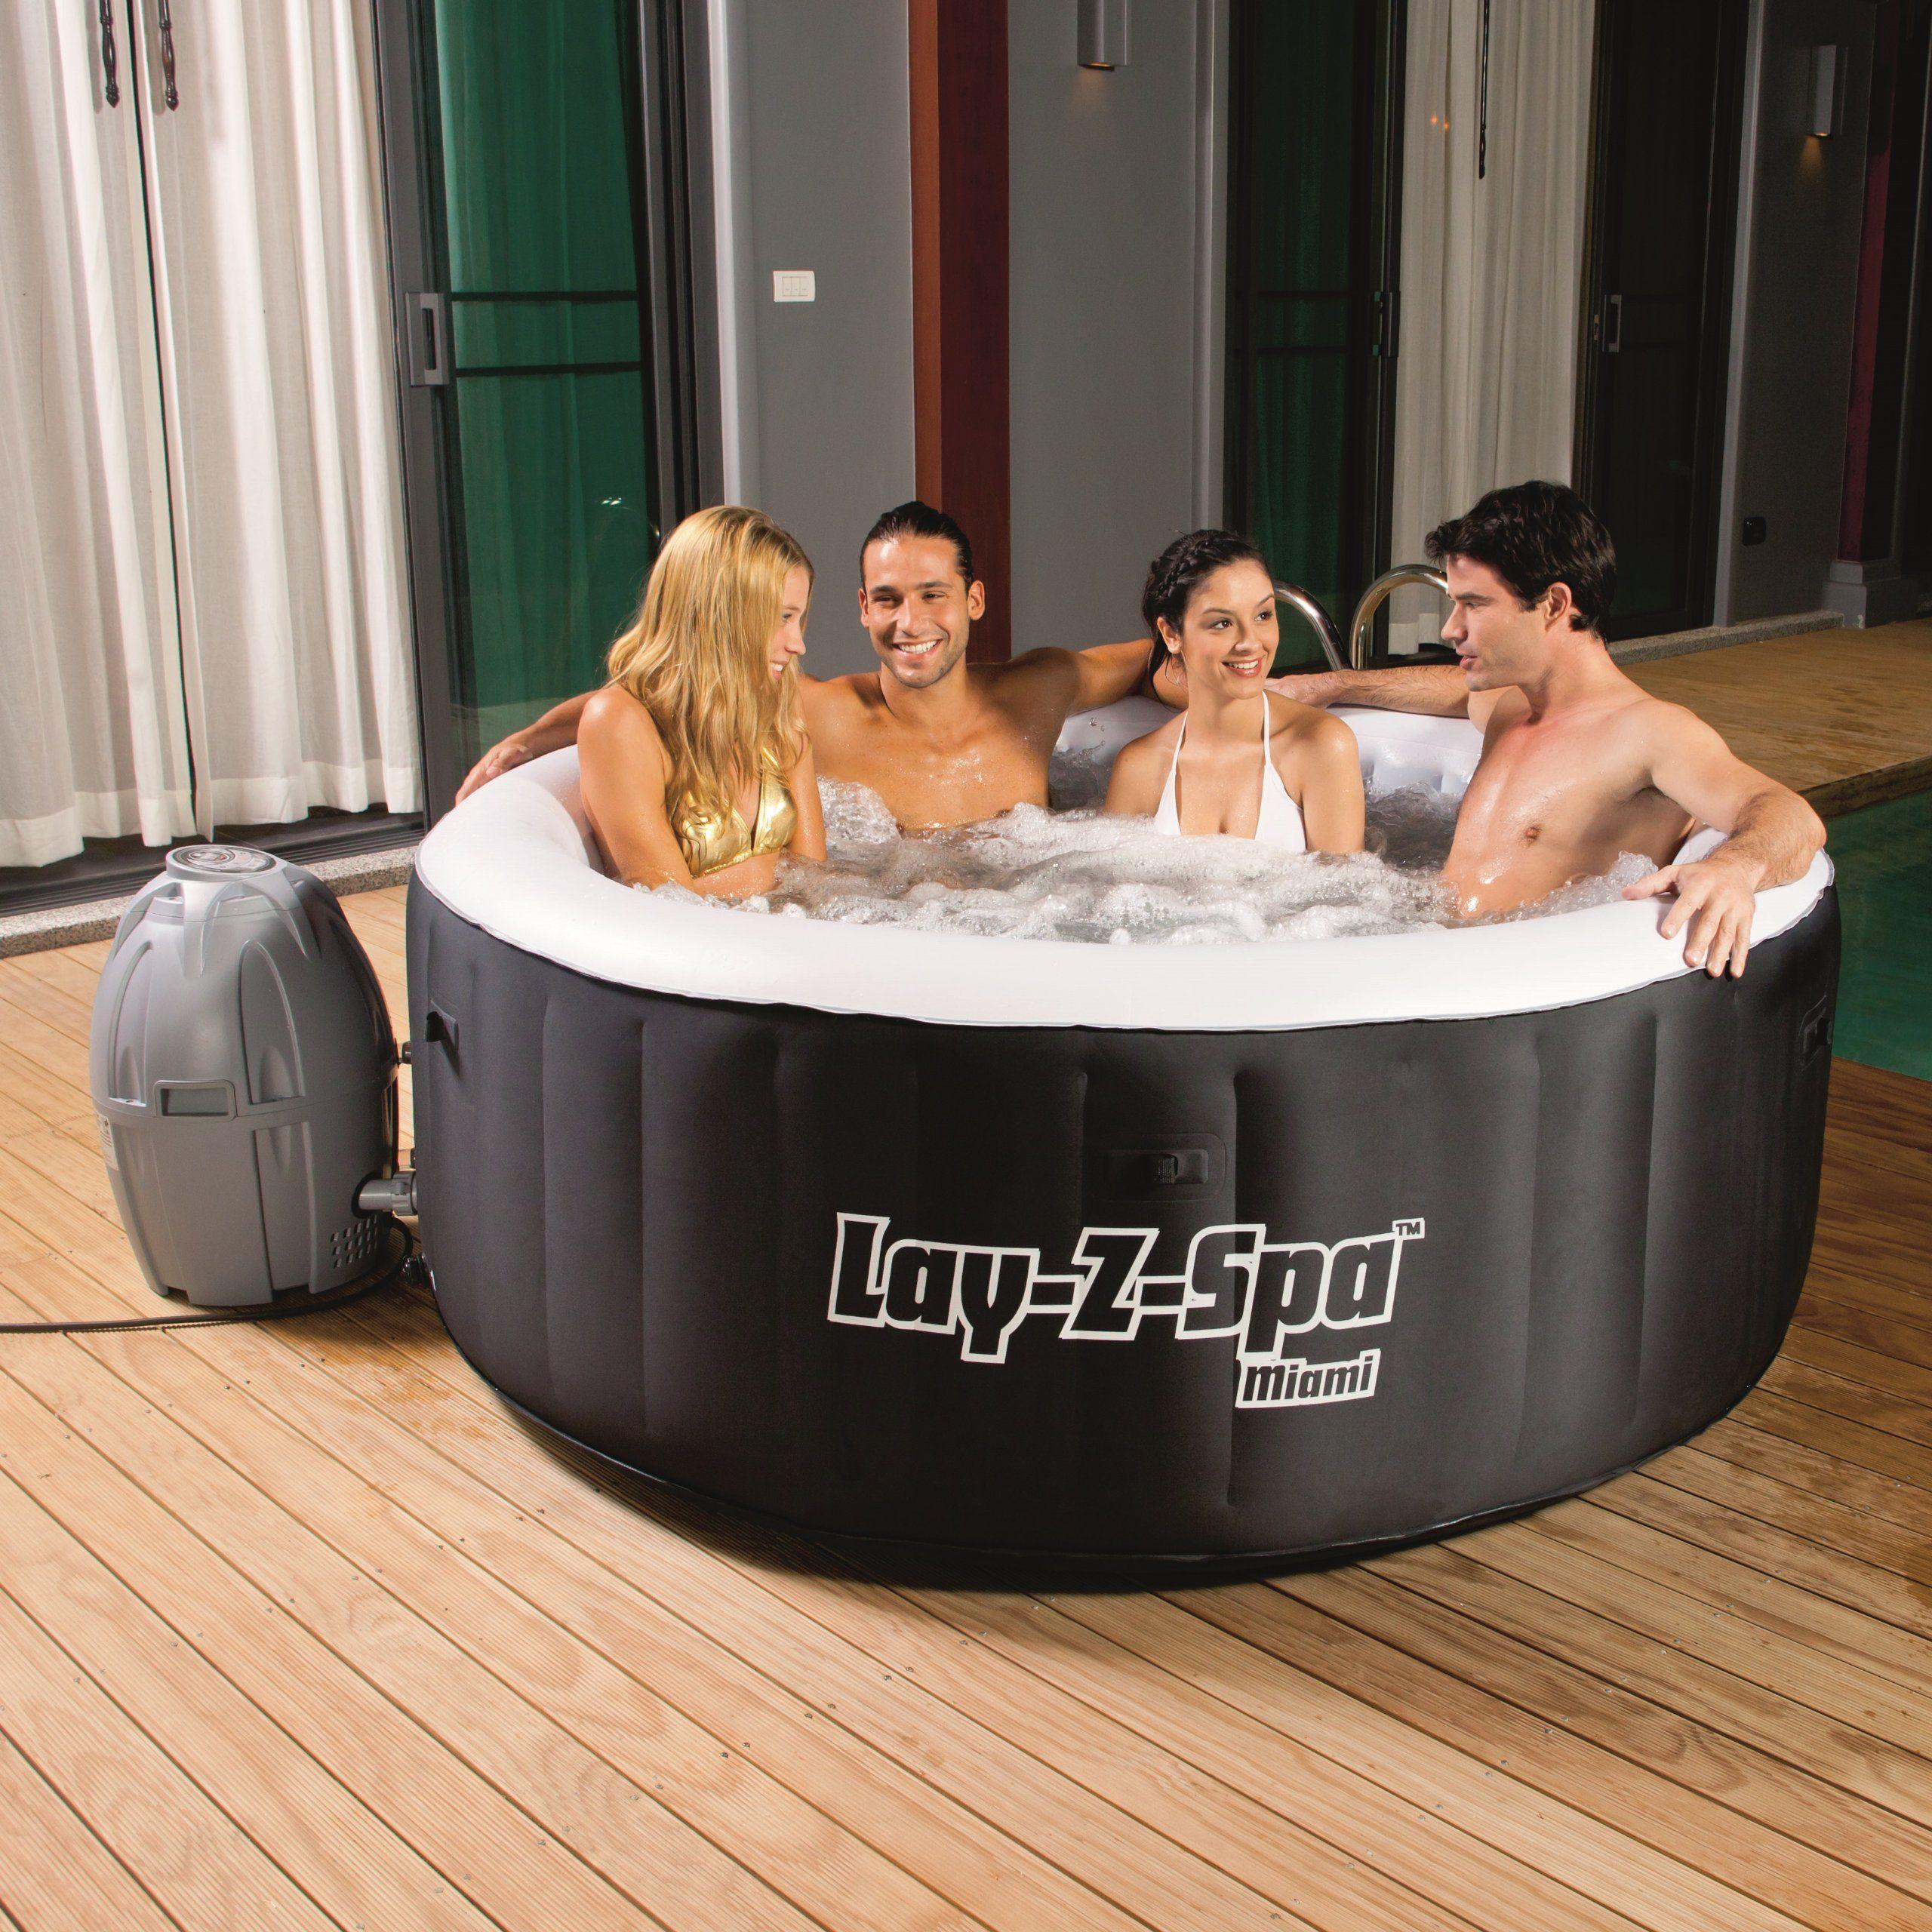 Amazon Com Bestway Lay Z Spa Miami Inflatable Hot Tub Patio Lawn Garden Portable Hot Tub Best Inflatable Hot Tub Inflatable Spas